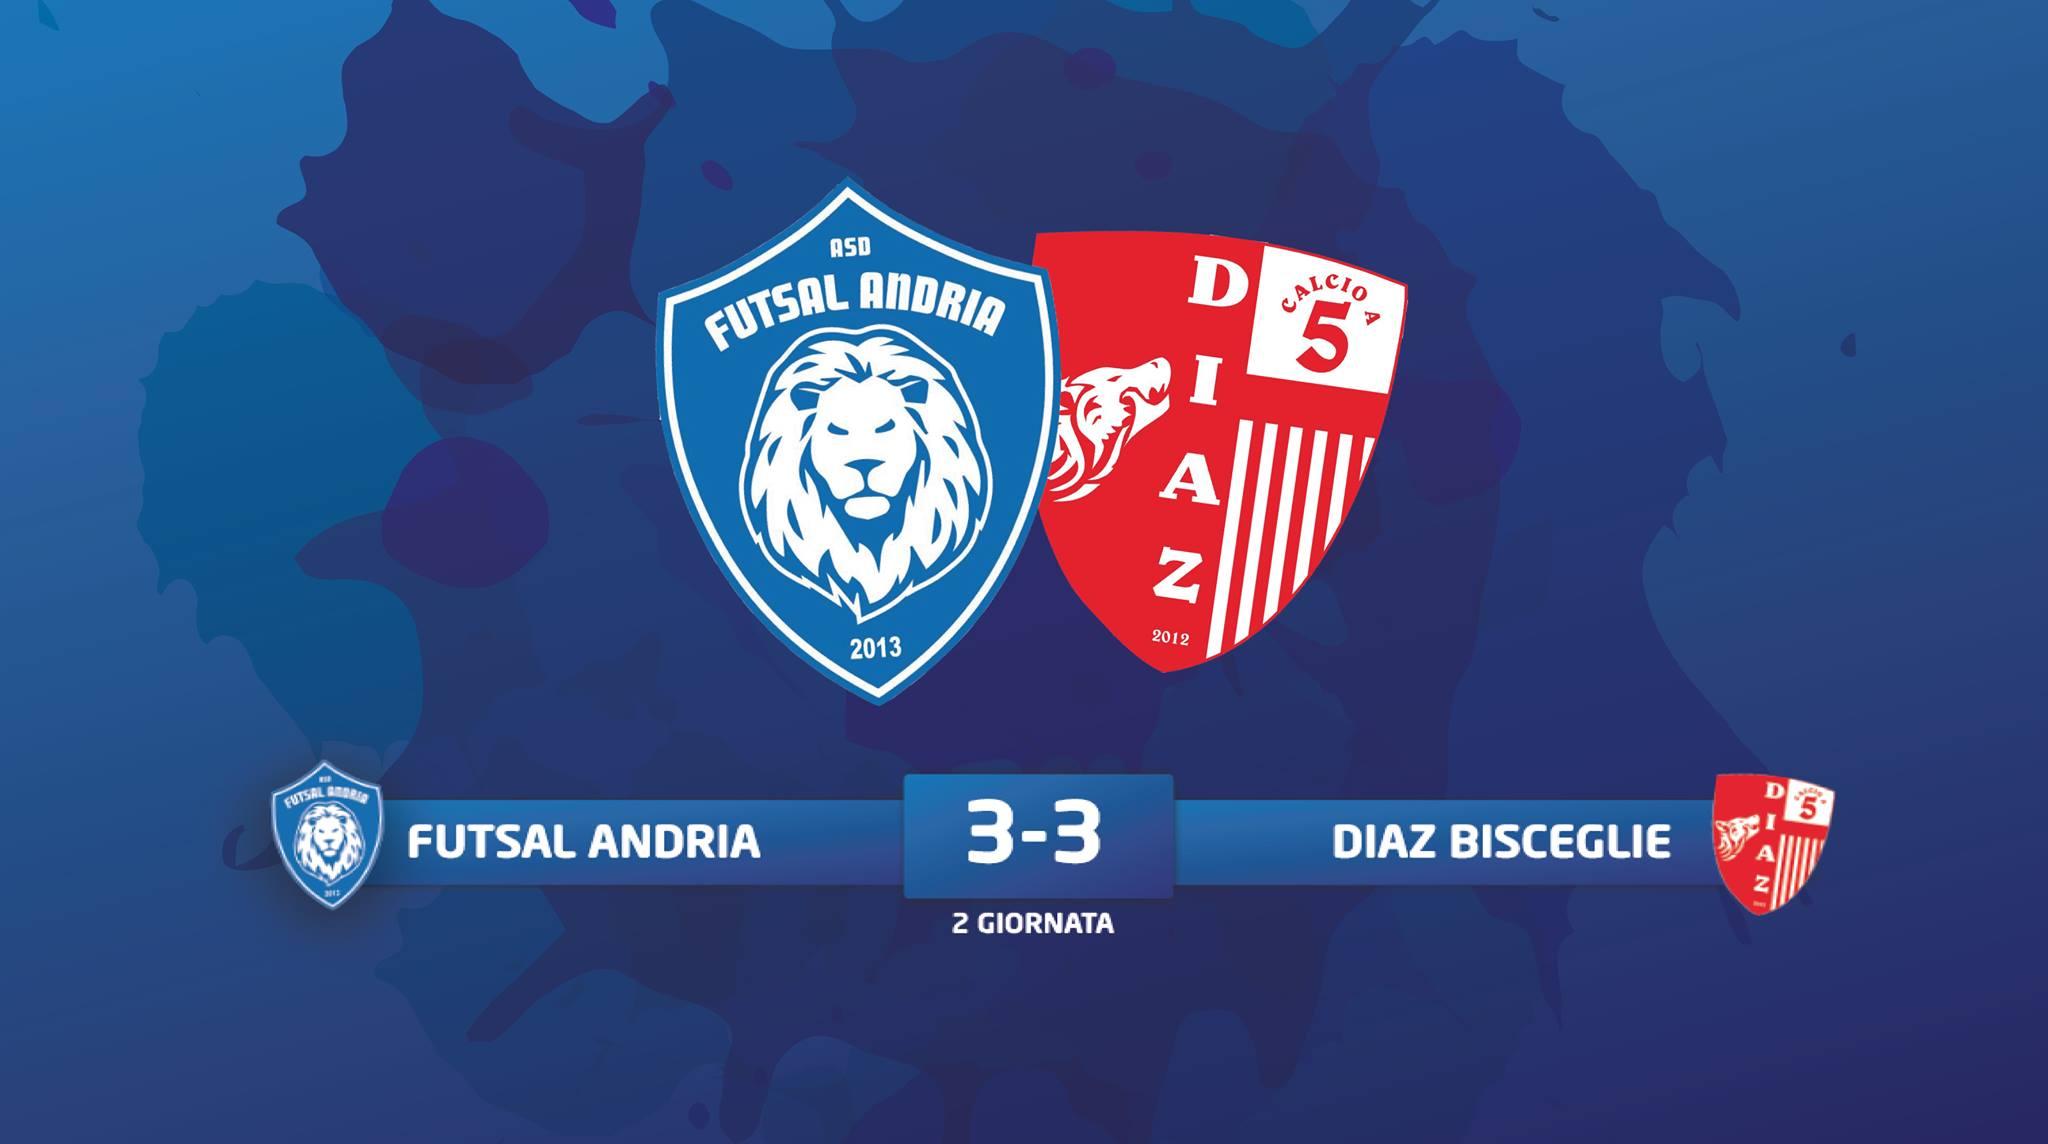 florigel-futsal-andria-diaz-bisceglie-3-3-highlights-2-giornata-serie-c1